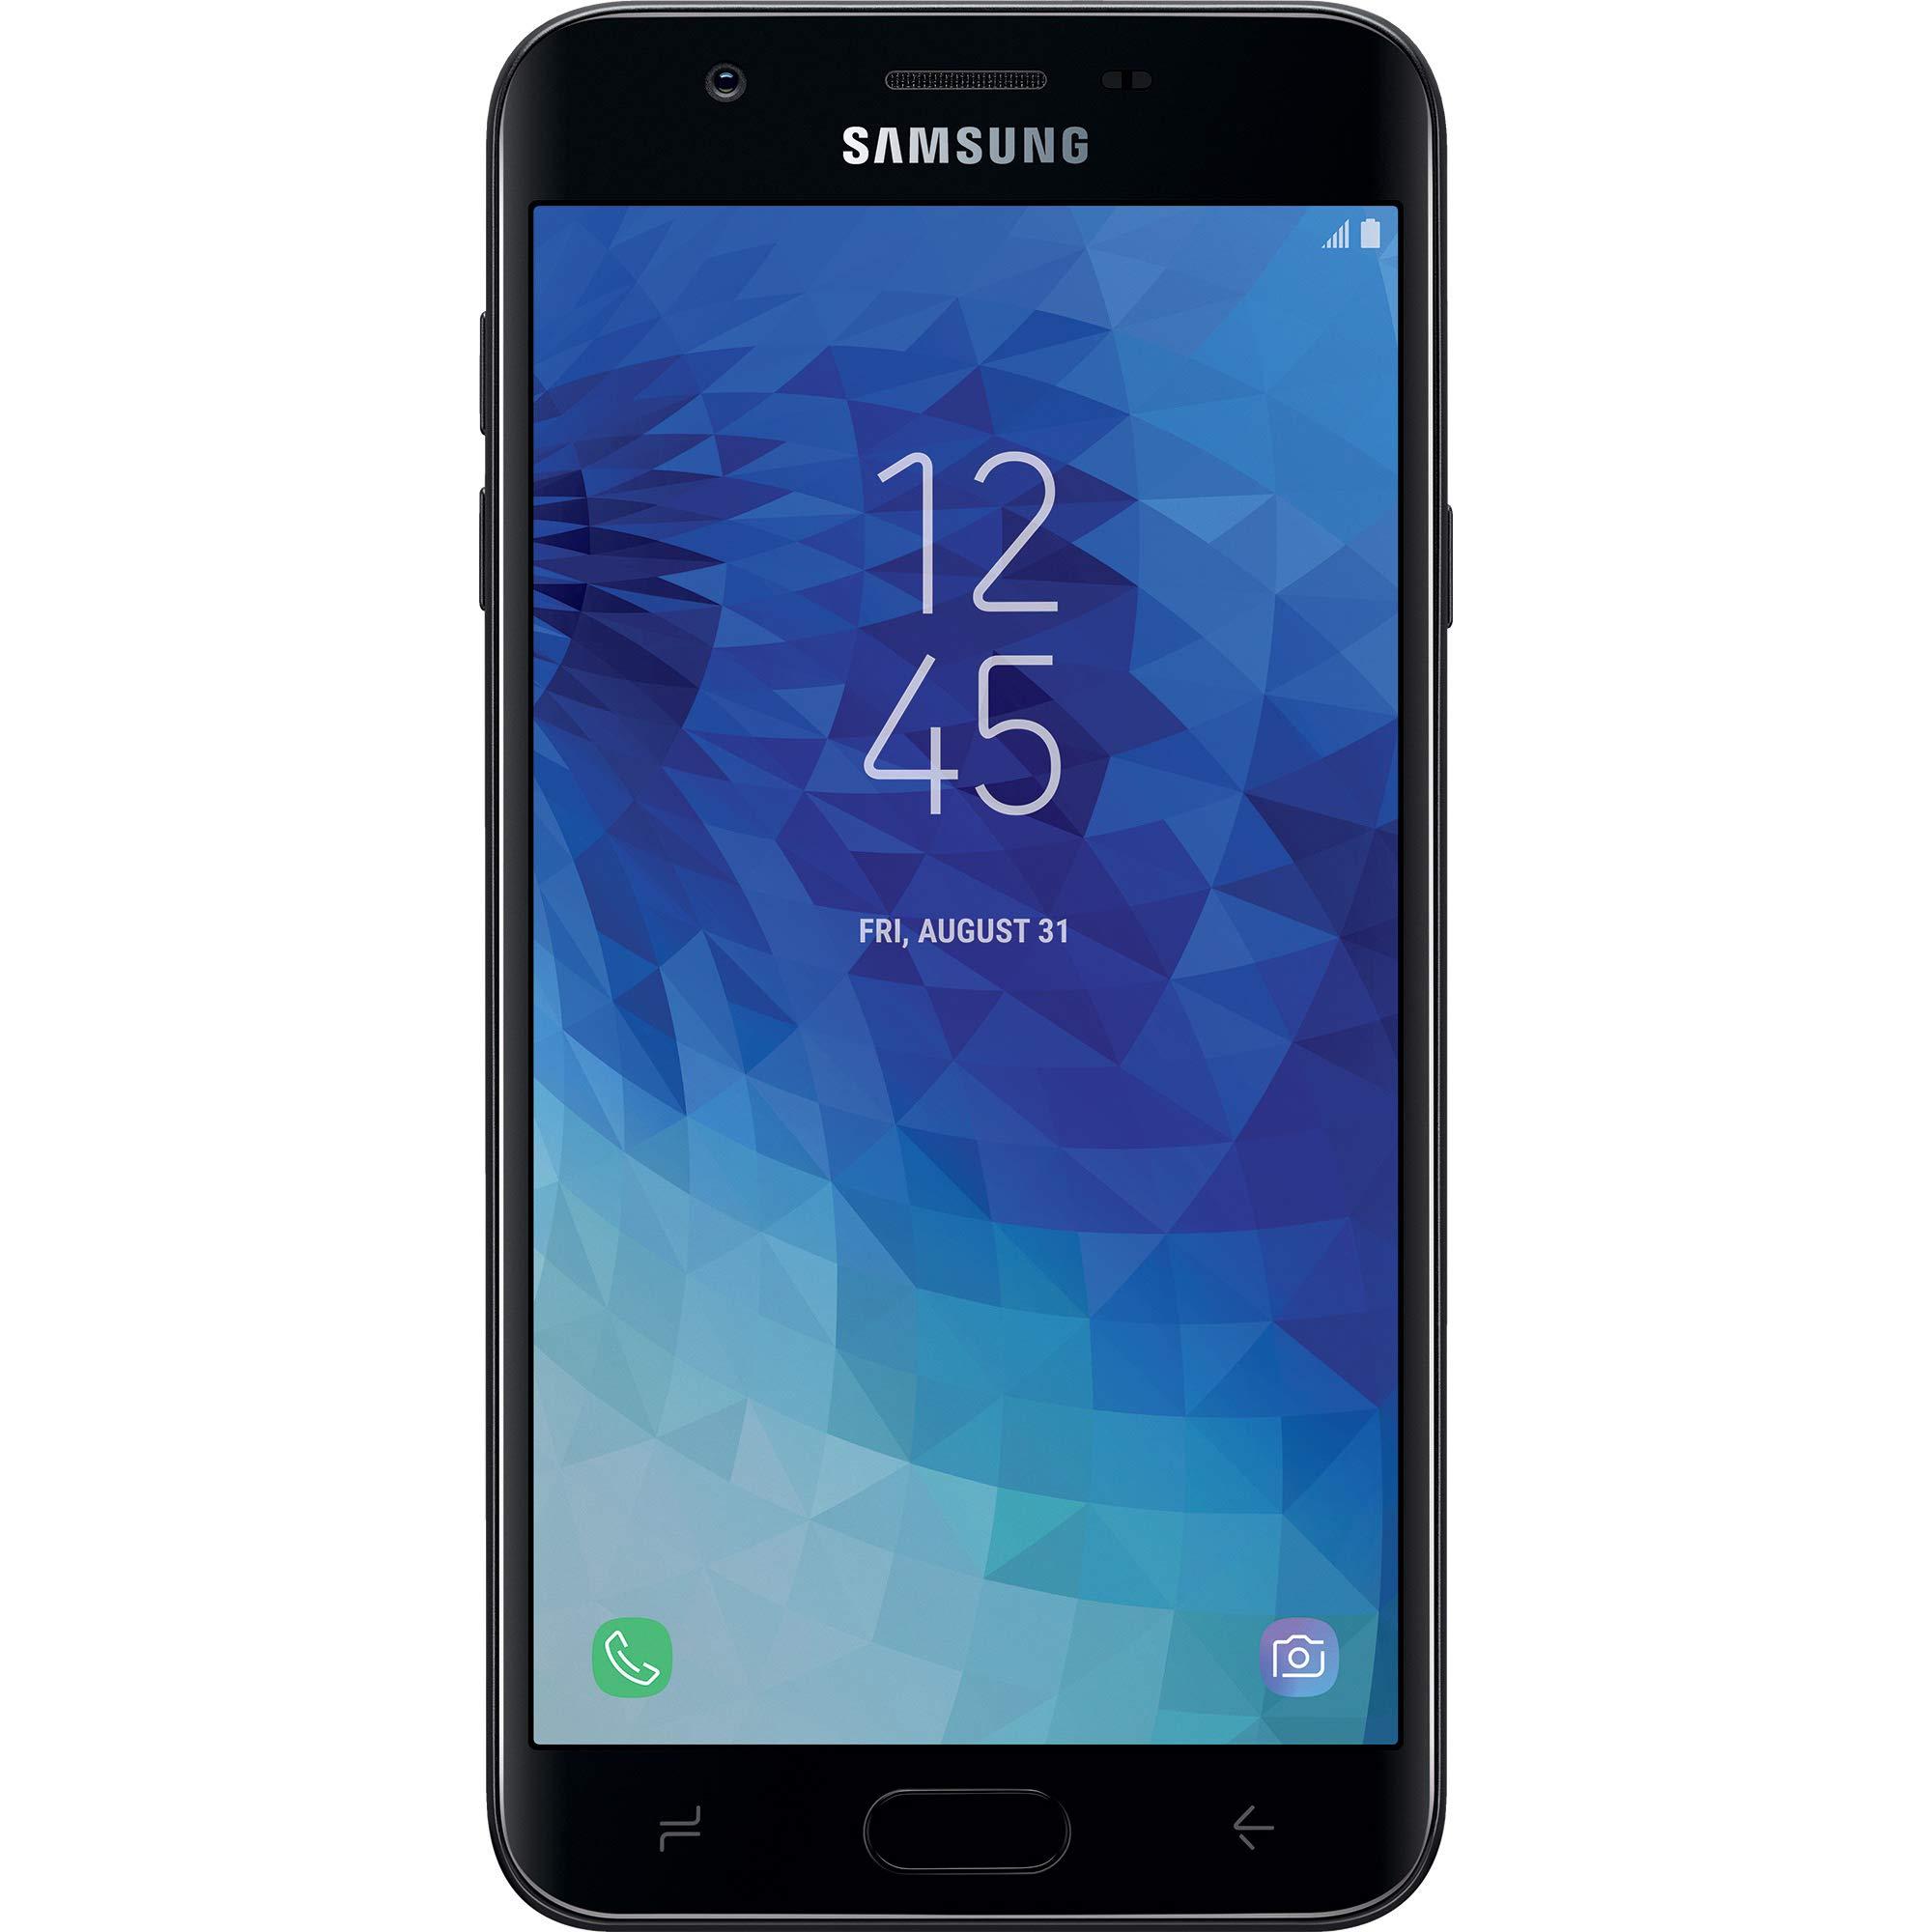 Net10 Samsung Galaxy J7 Crown 4G LTE Prepaid Smartphone (Locked) - Black - 16GB - Sim Card Included - CDMA